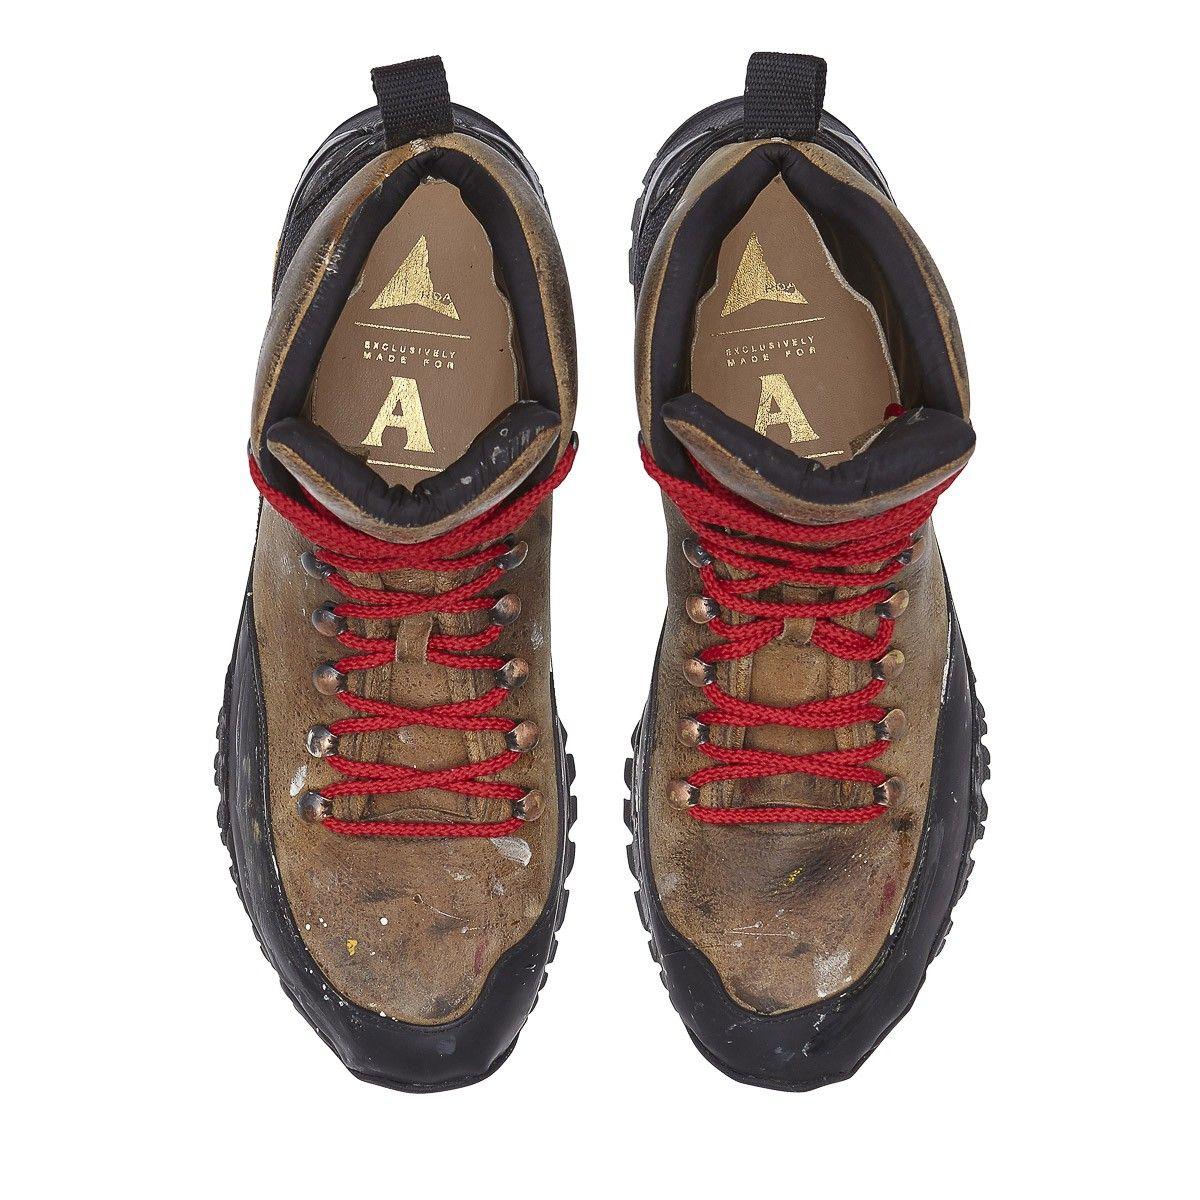 highxtar_boots_aw16_4